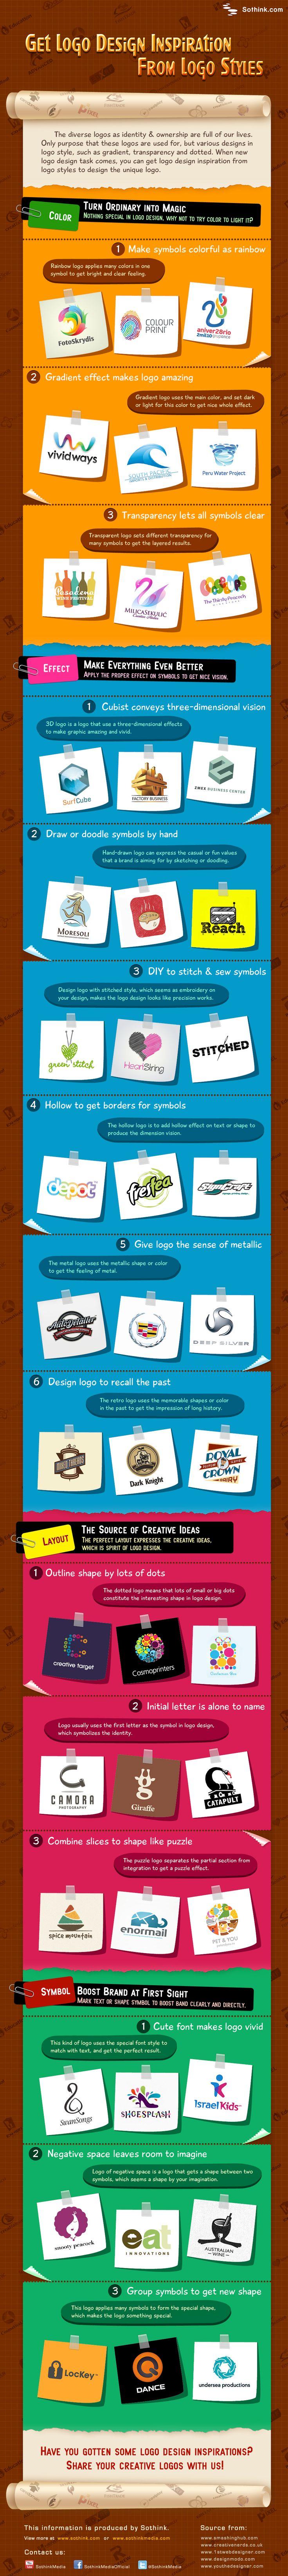 Logo DesignDesign Inspiration, Logo Design, Design Ideas, Logosdesign, Logo Inspiration, Inspiration Infographic, Logos Design, Graphics Design, Logo Style